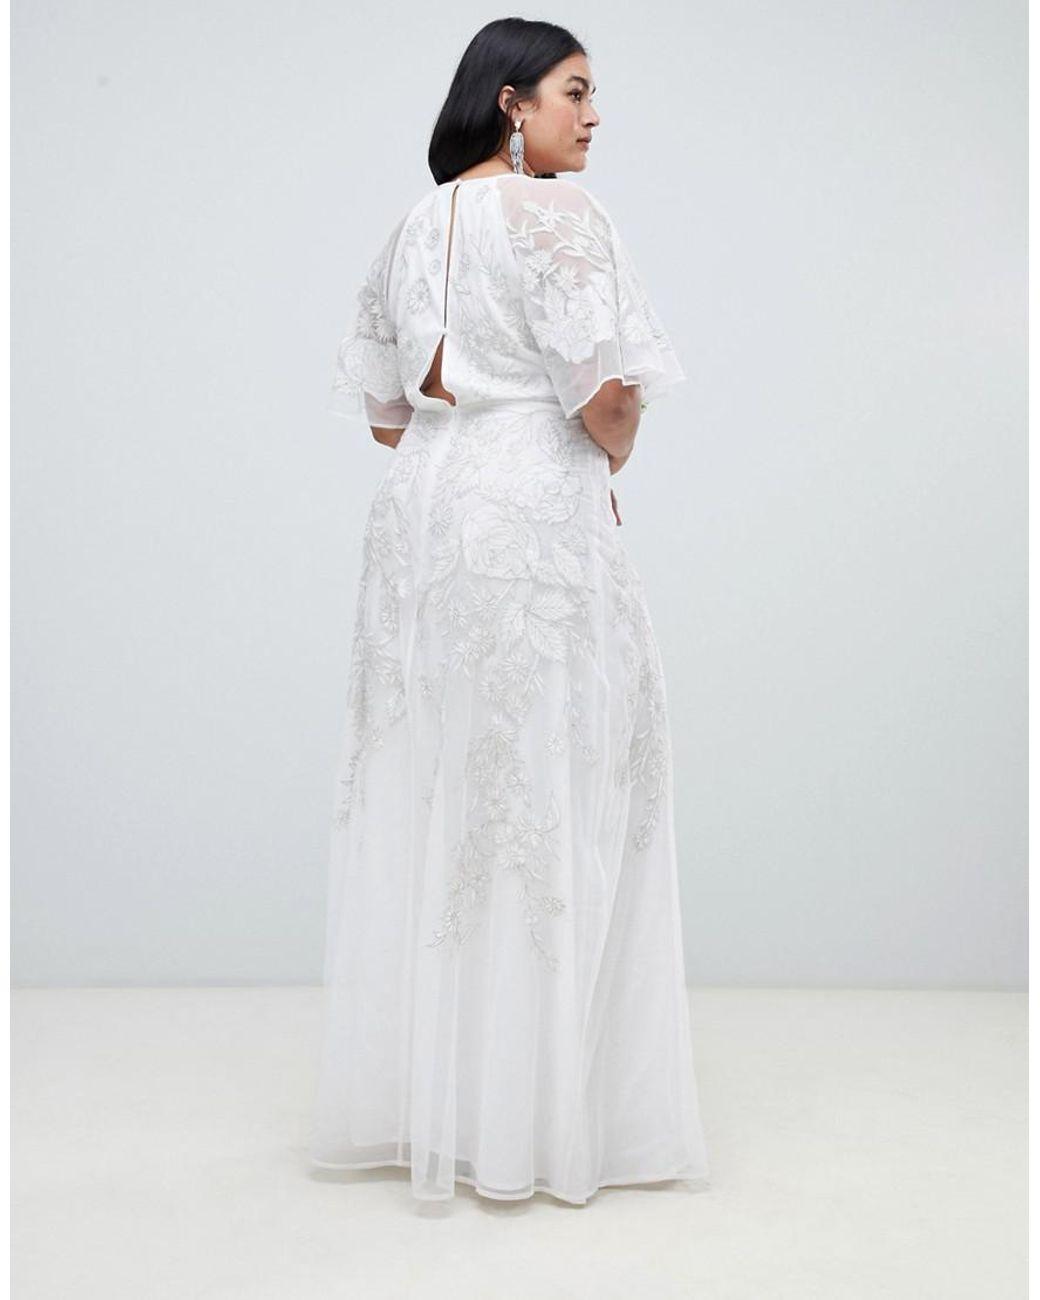 Asos Wedding Dress.Women S White Asos Edition Curve Floral Applique Wedding Dress